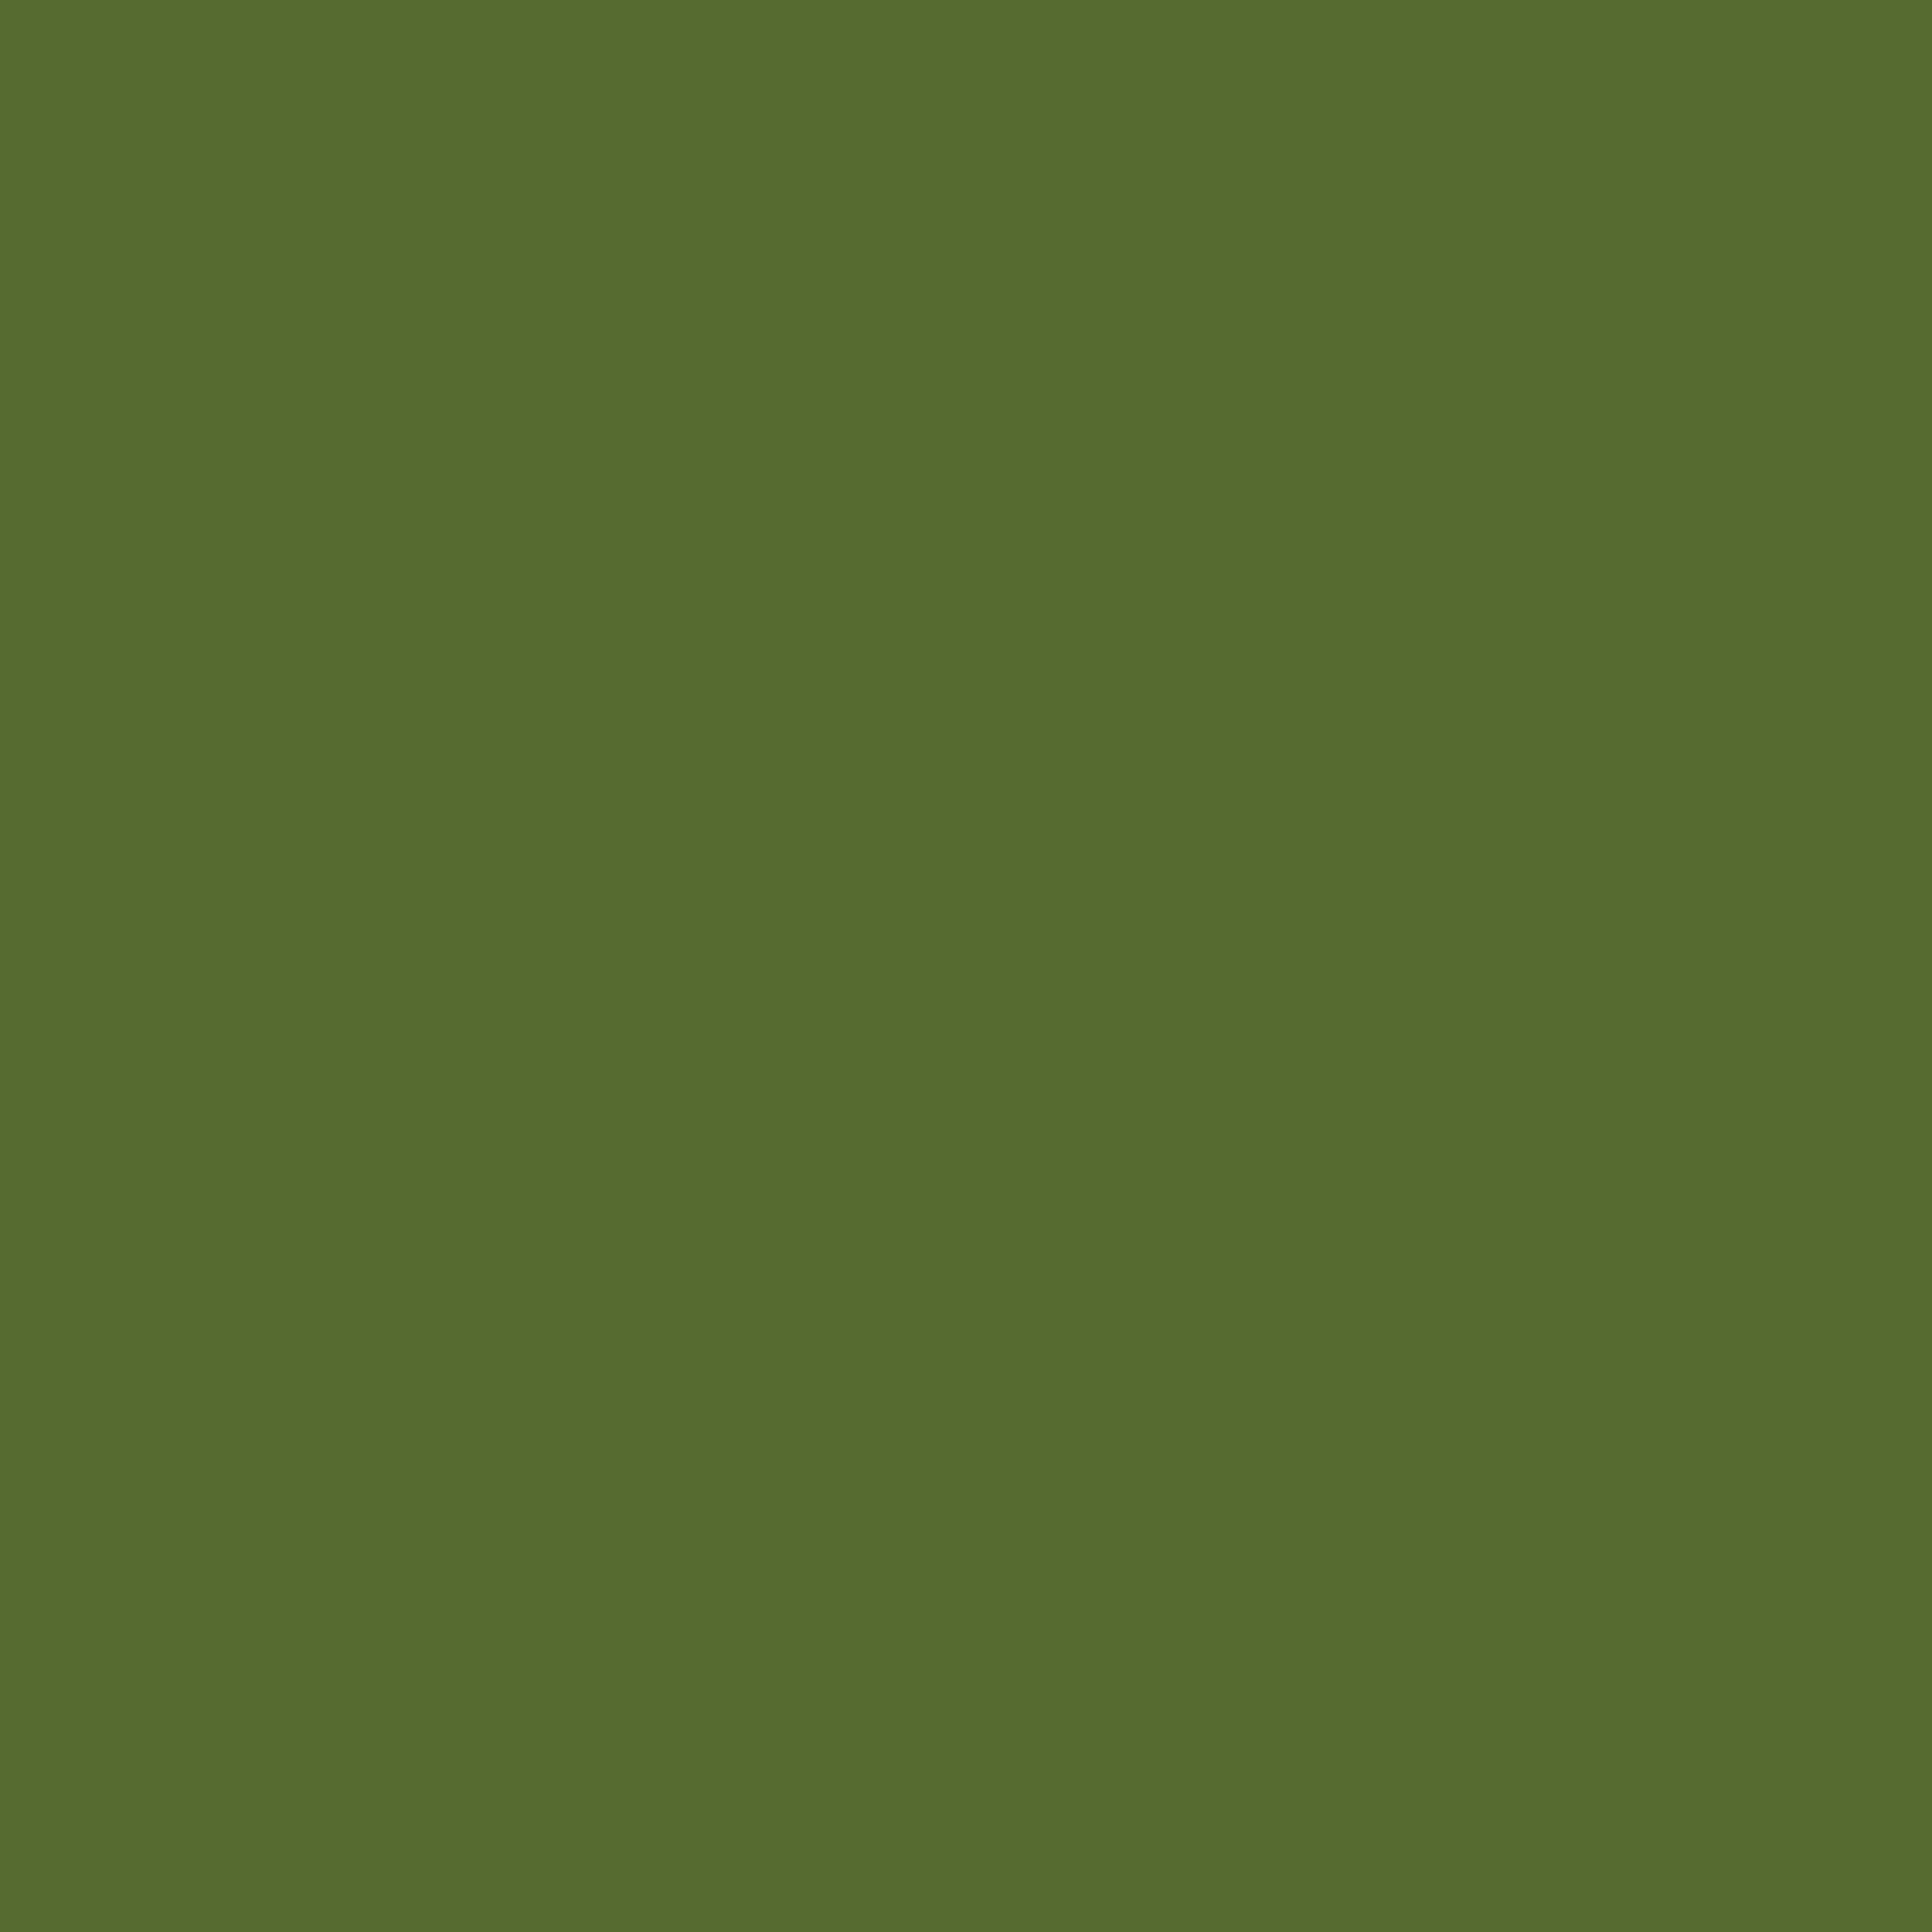 Weiß-oliv